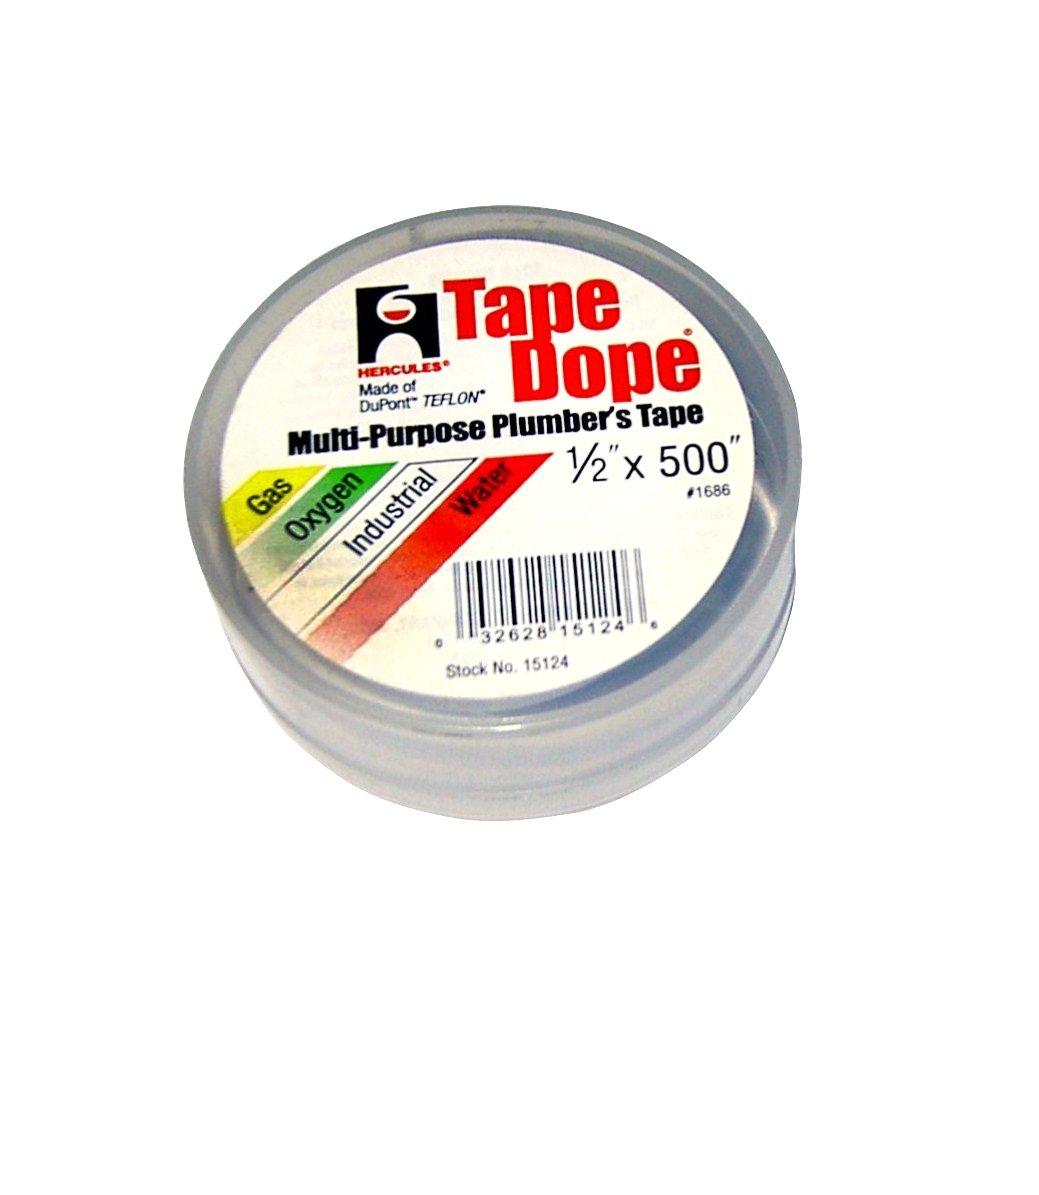 Tape Dope